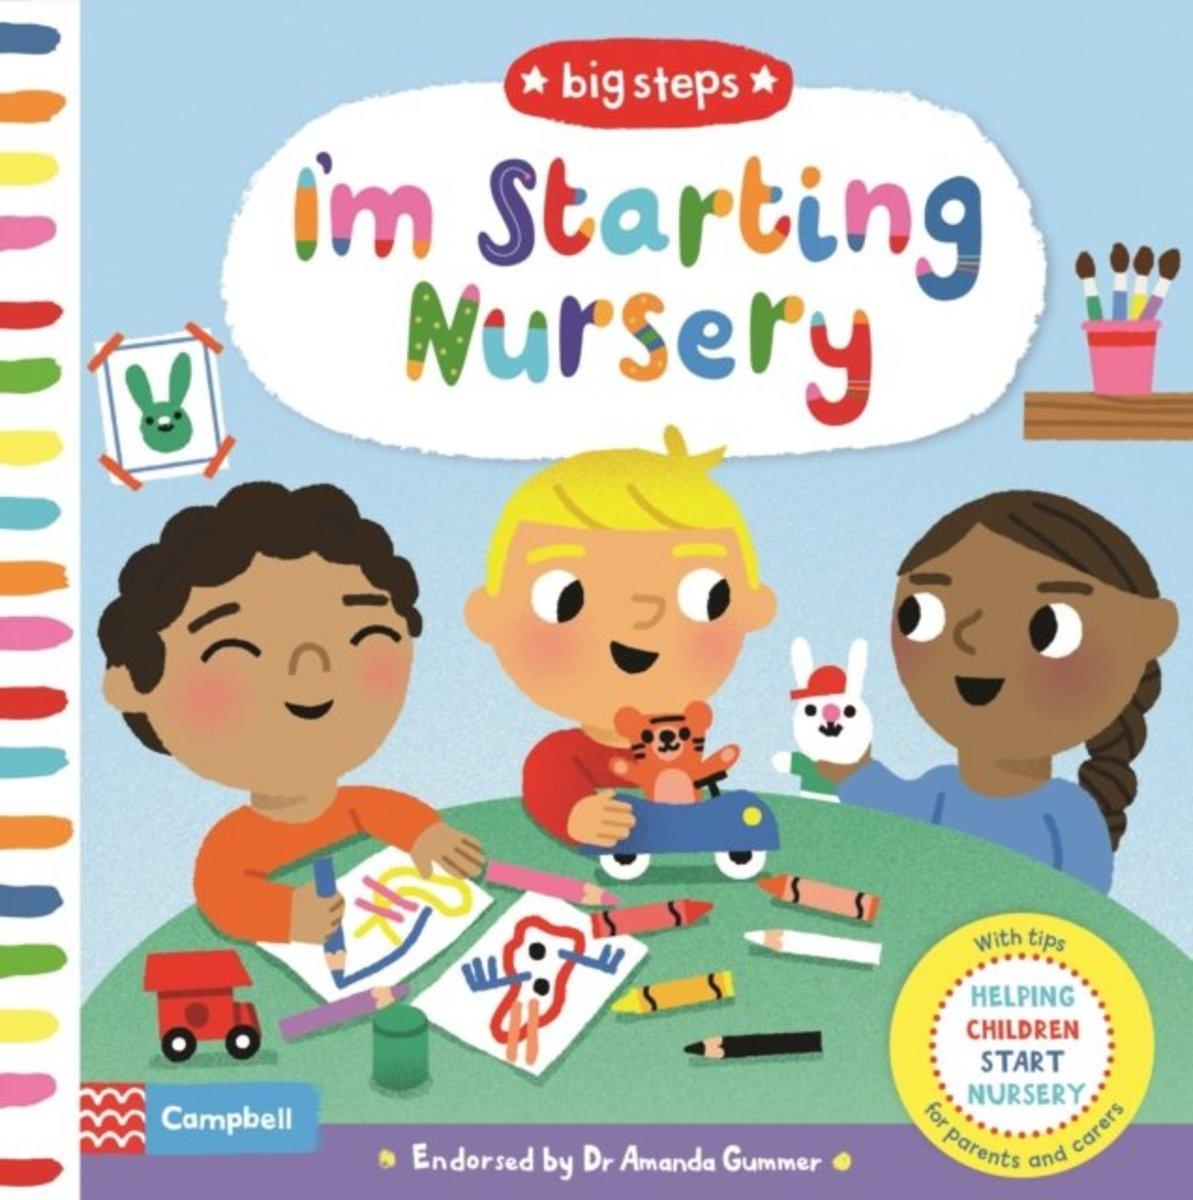 Big Steps: I'm Starting Nursery